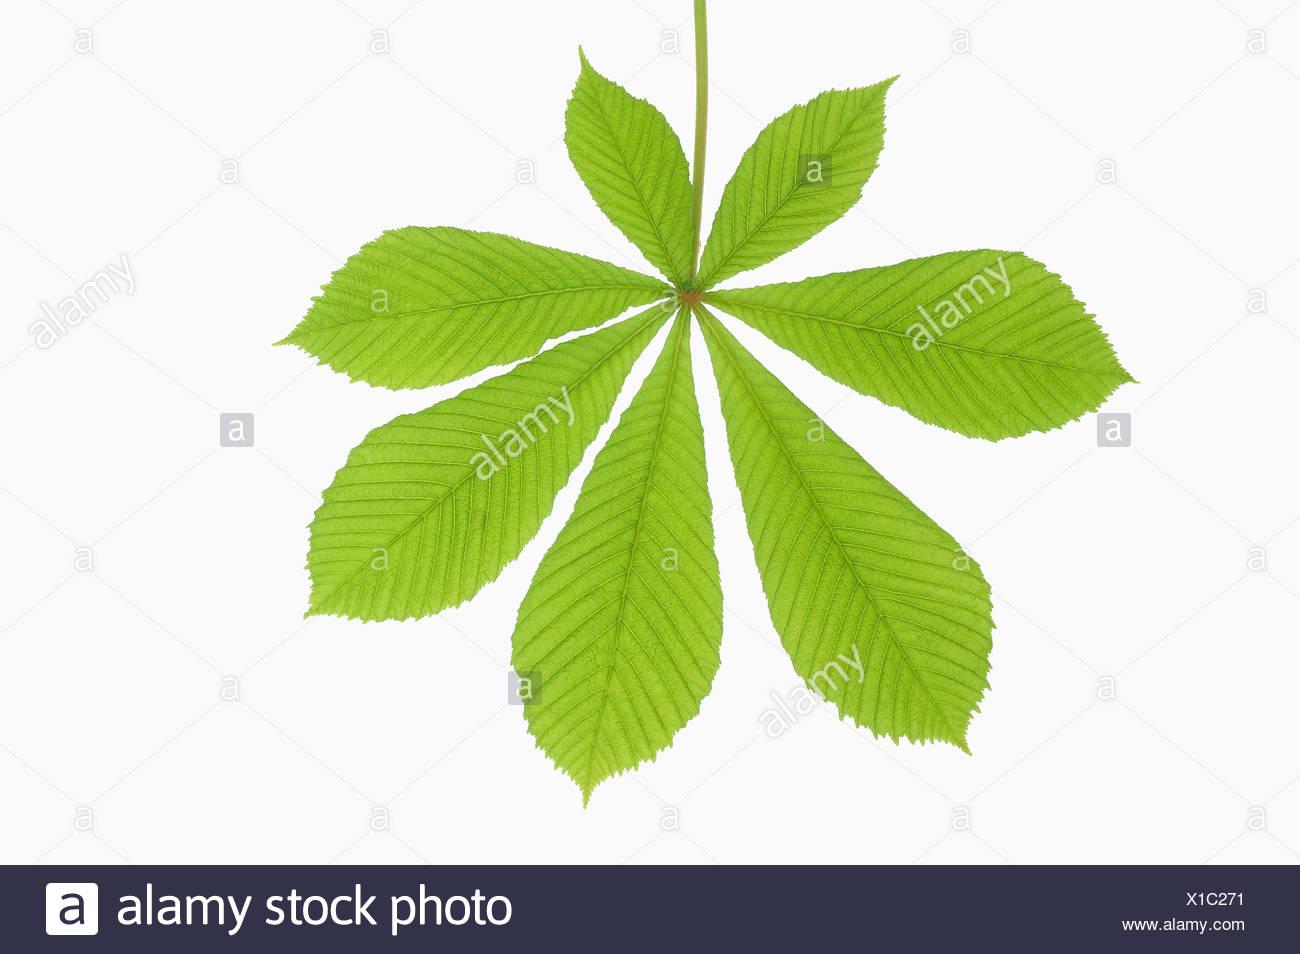 Horse Chestnut leaf (Aesculus hippocastanum), close-up - Stock Image